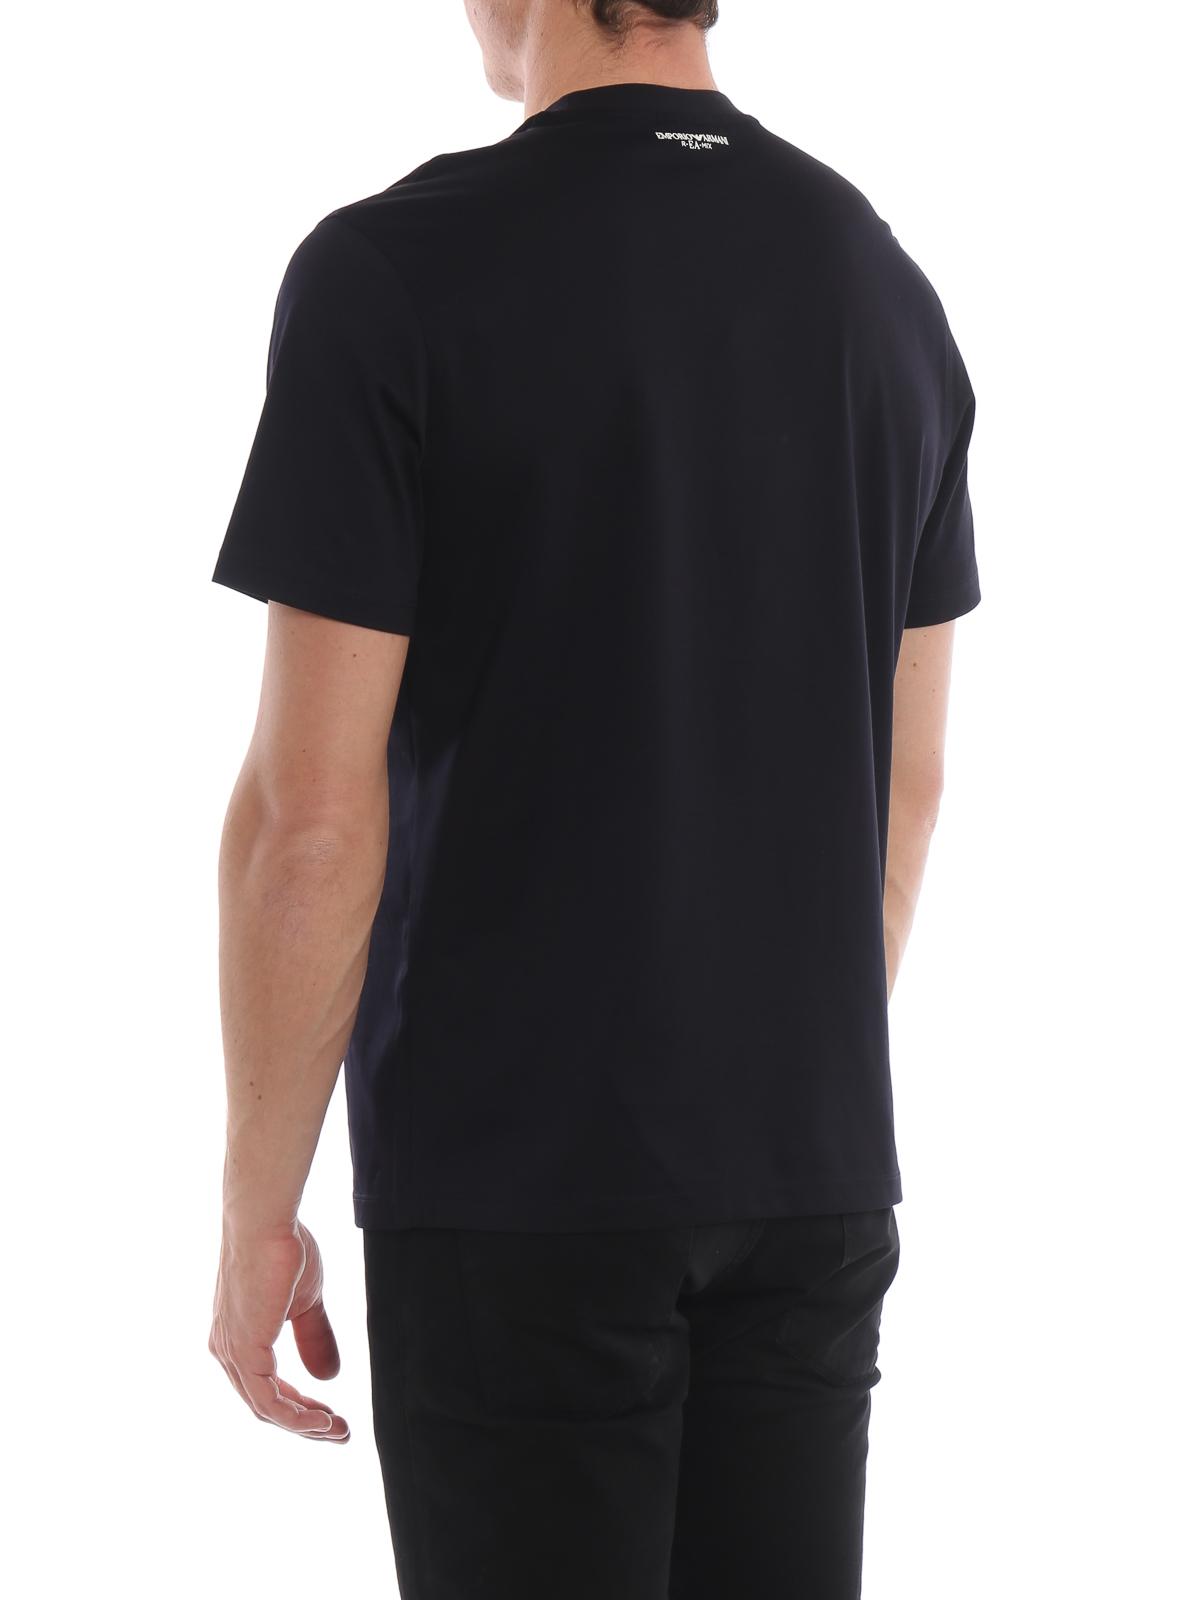 ccecca4a51 Emporio Armani - Rubberized maxi logo blue cotton T-shirt - t-shirts ...